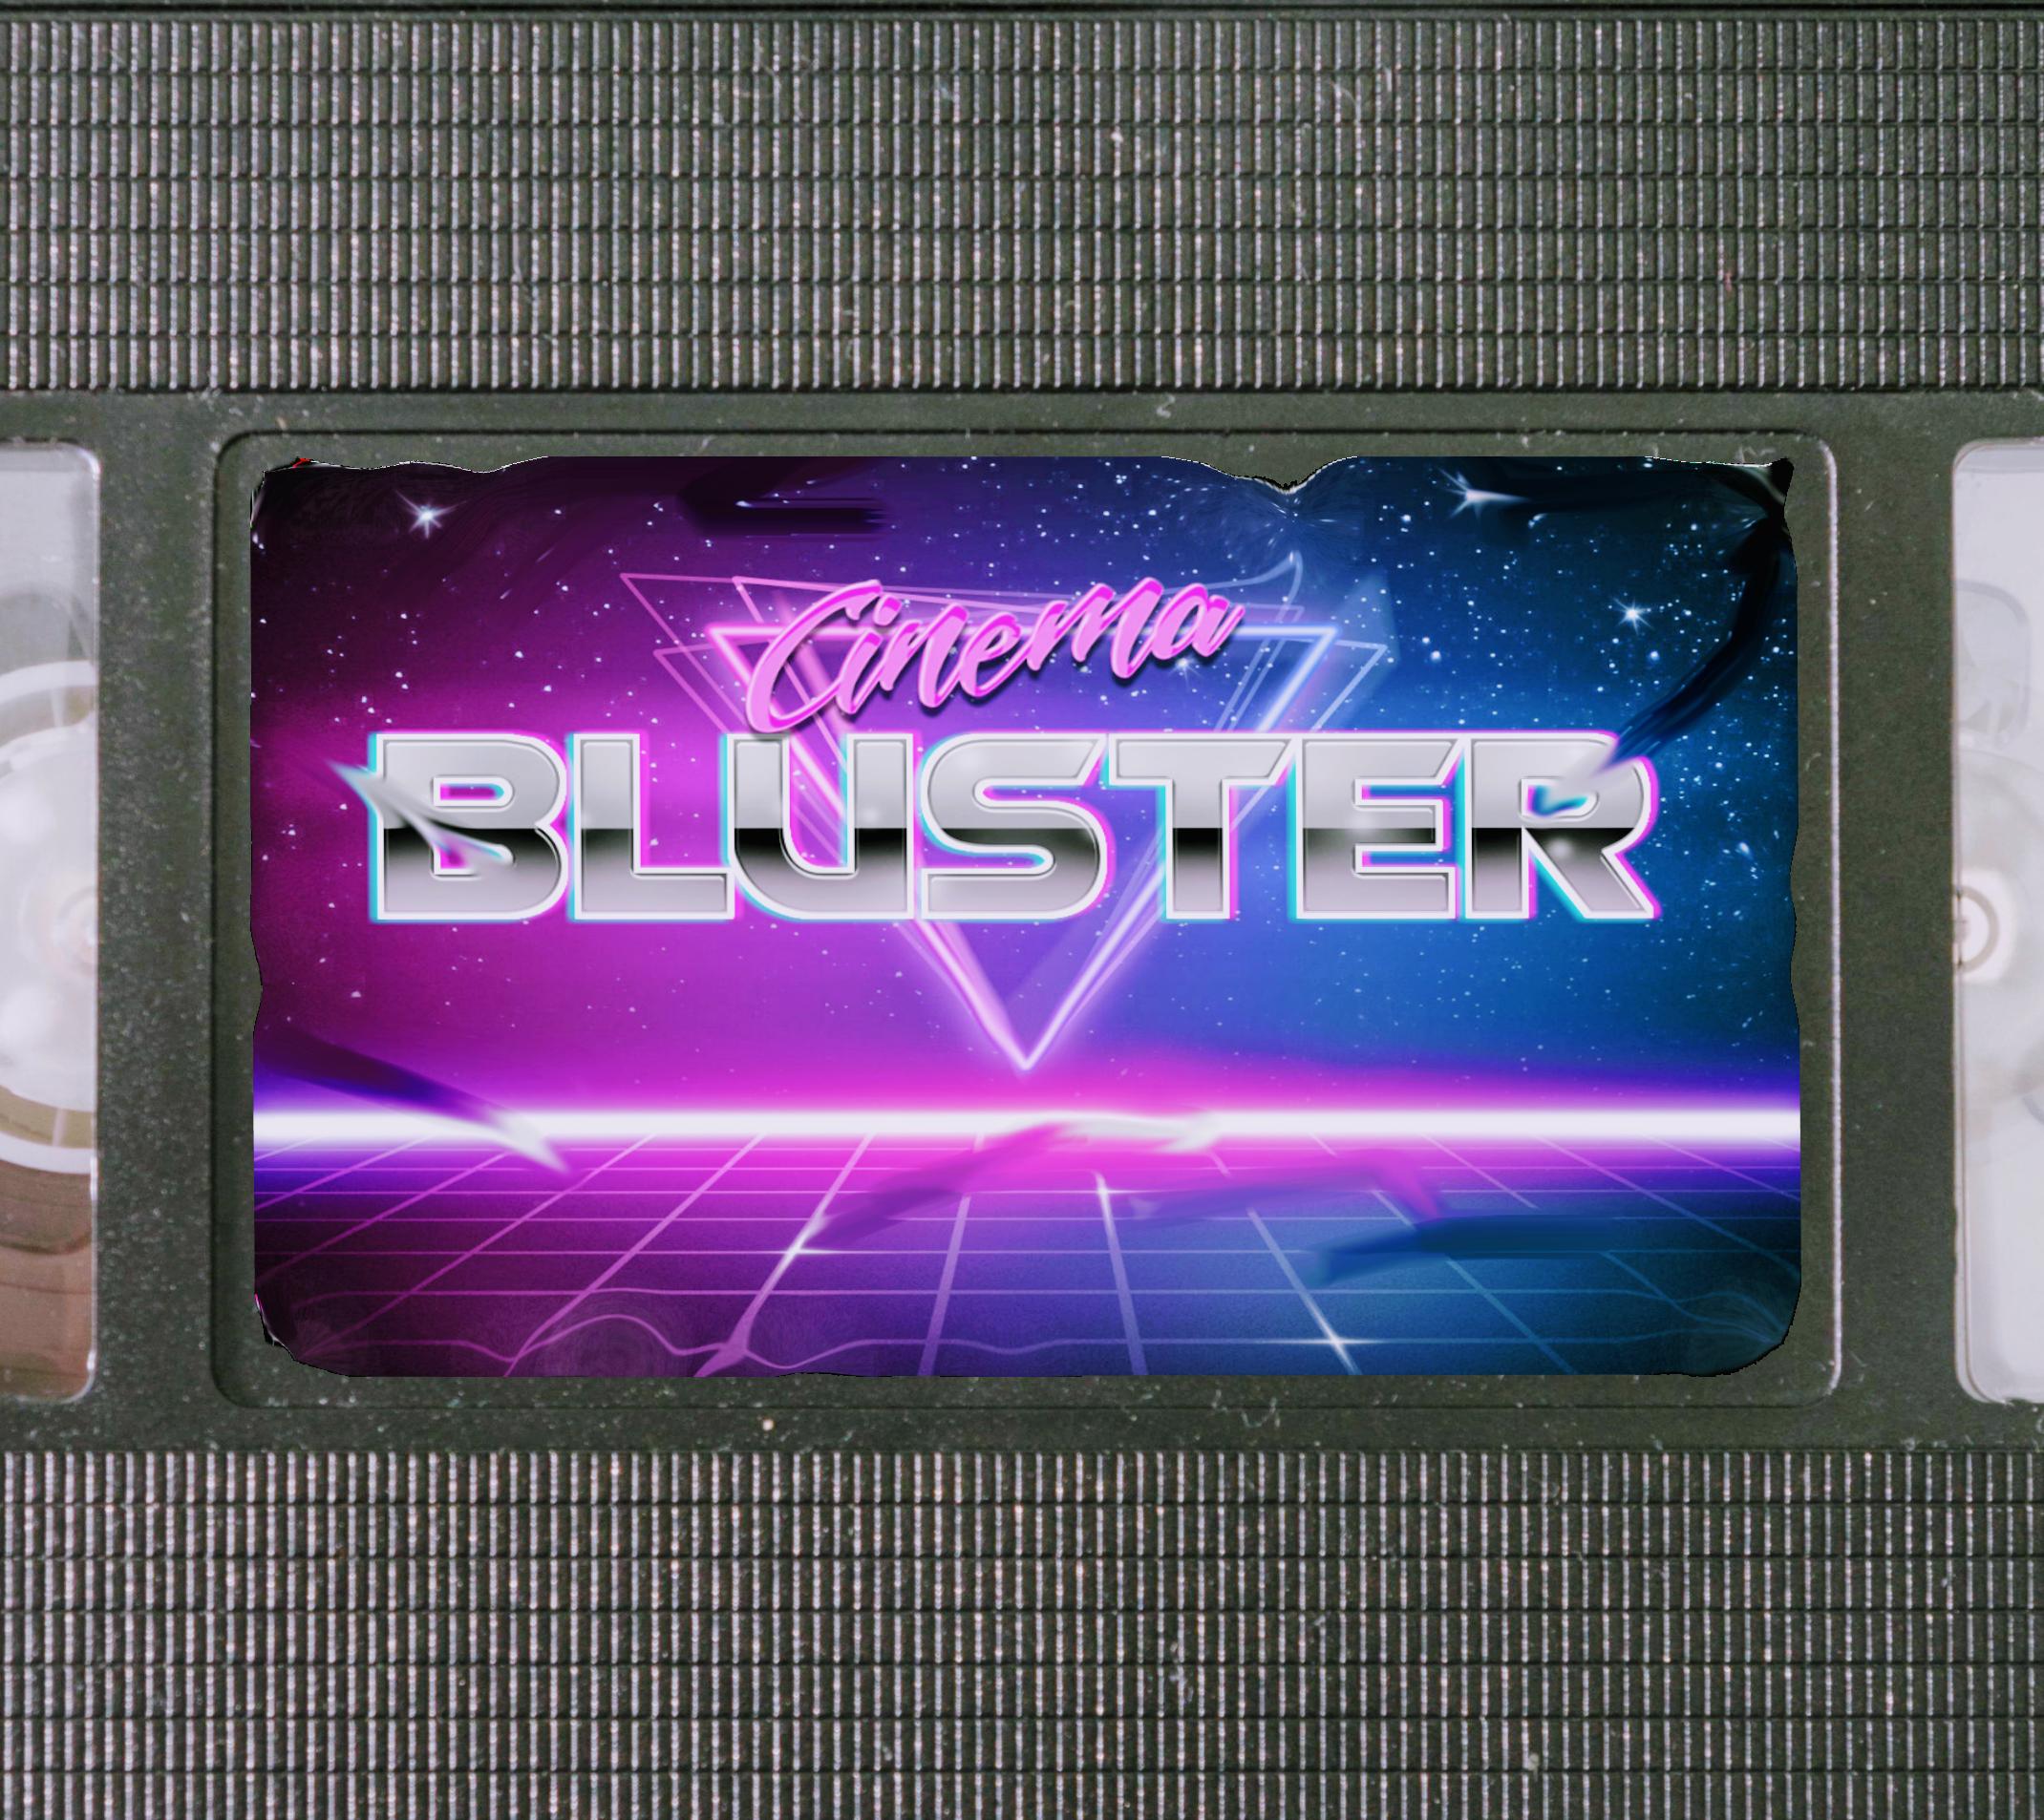 Cinema Bluster show art